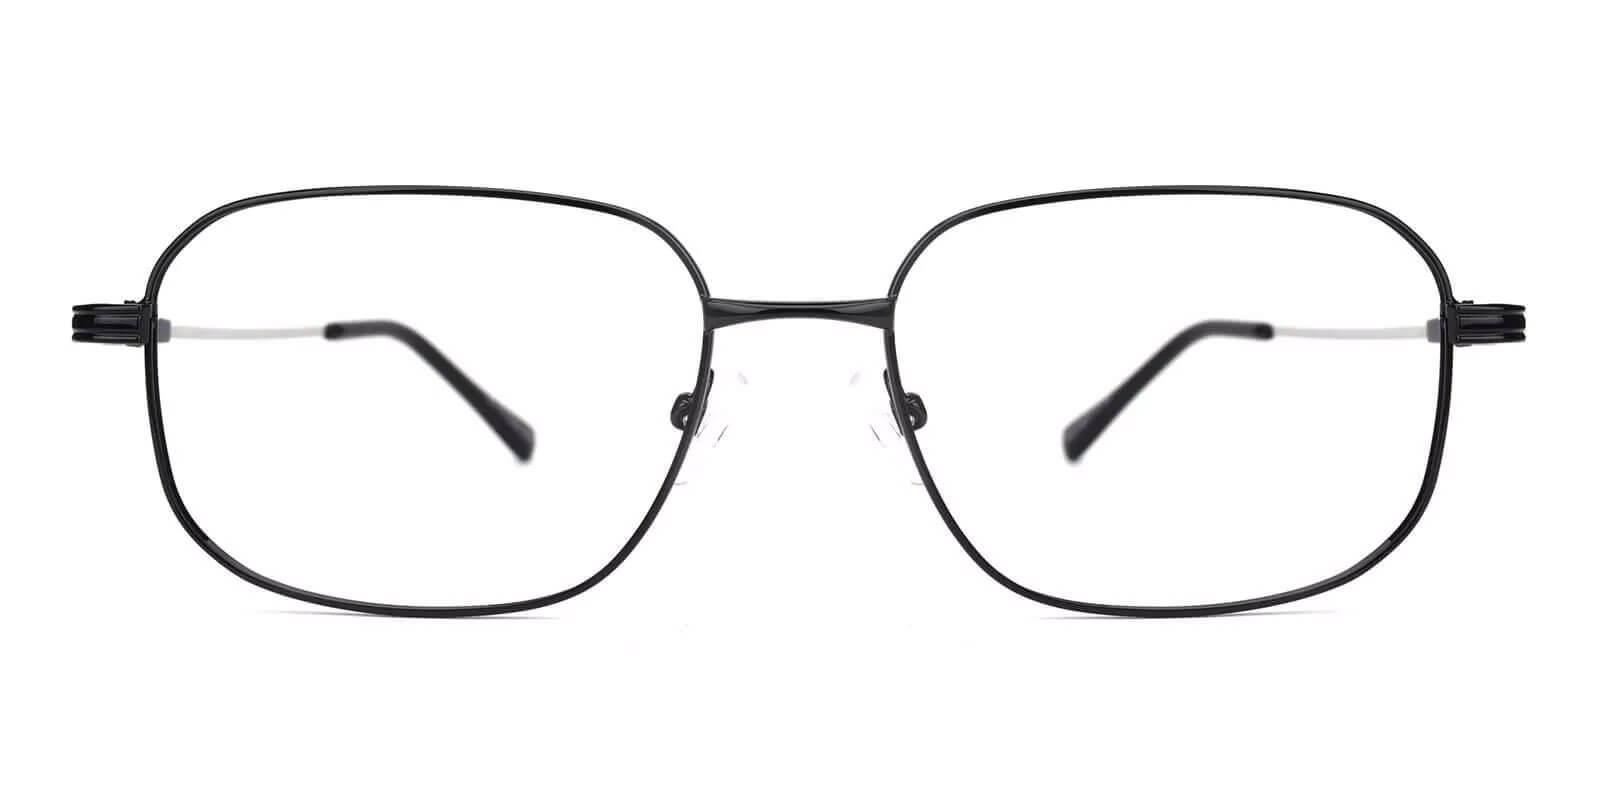 Anthony Black Metal NosePads , Eyeglasses Frames from ABBE Glasses